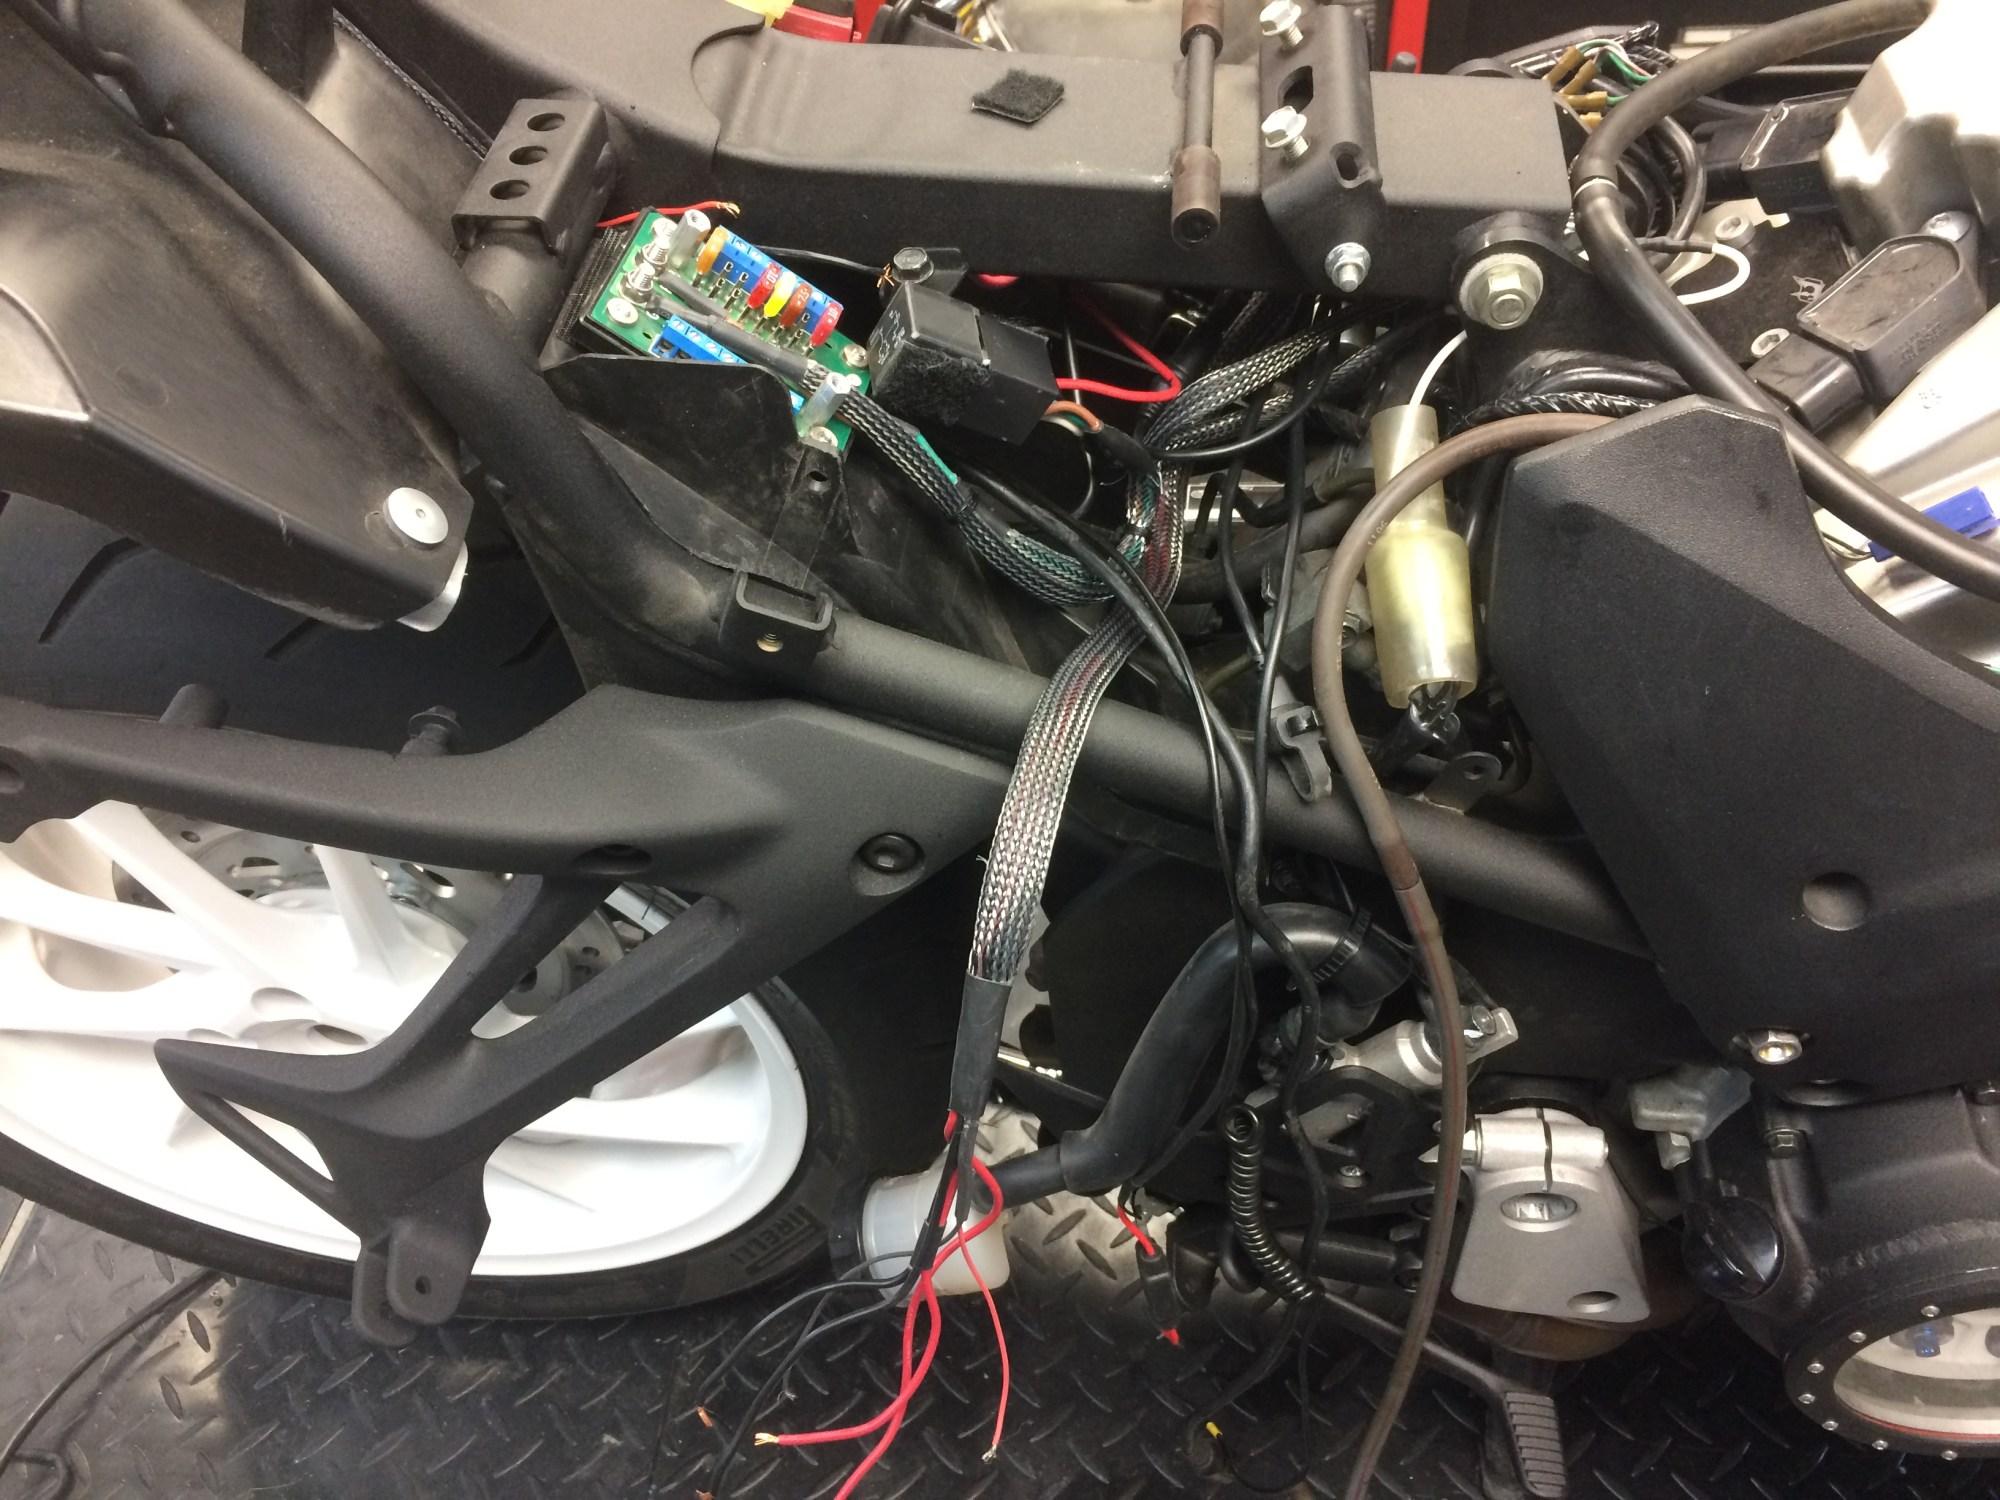 hight resolution of appealing 2001 honda rc51 wiring diagram gallery best image wire 99 honda rc51 breathtaking 2000 honda